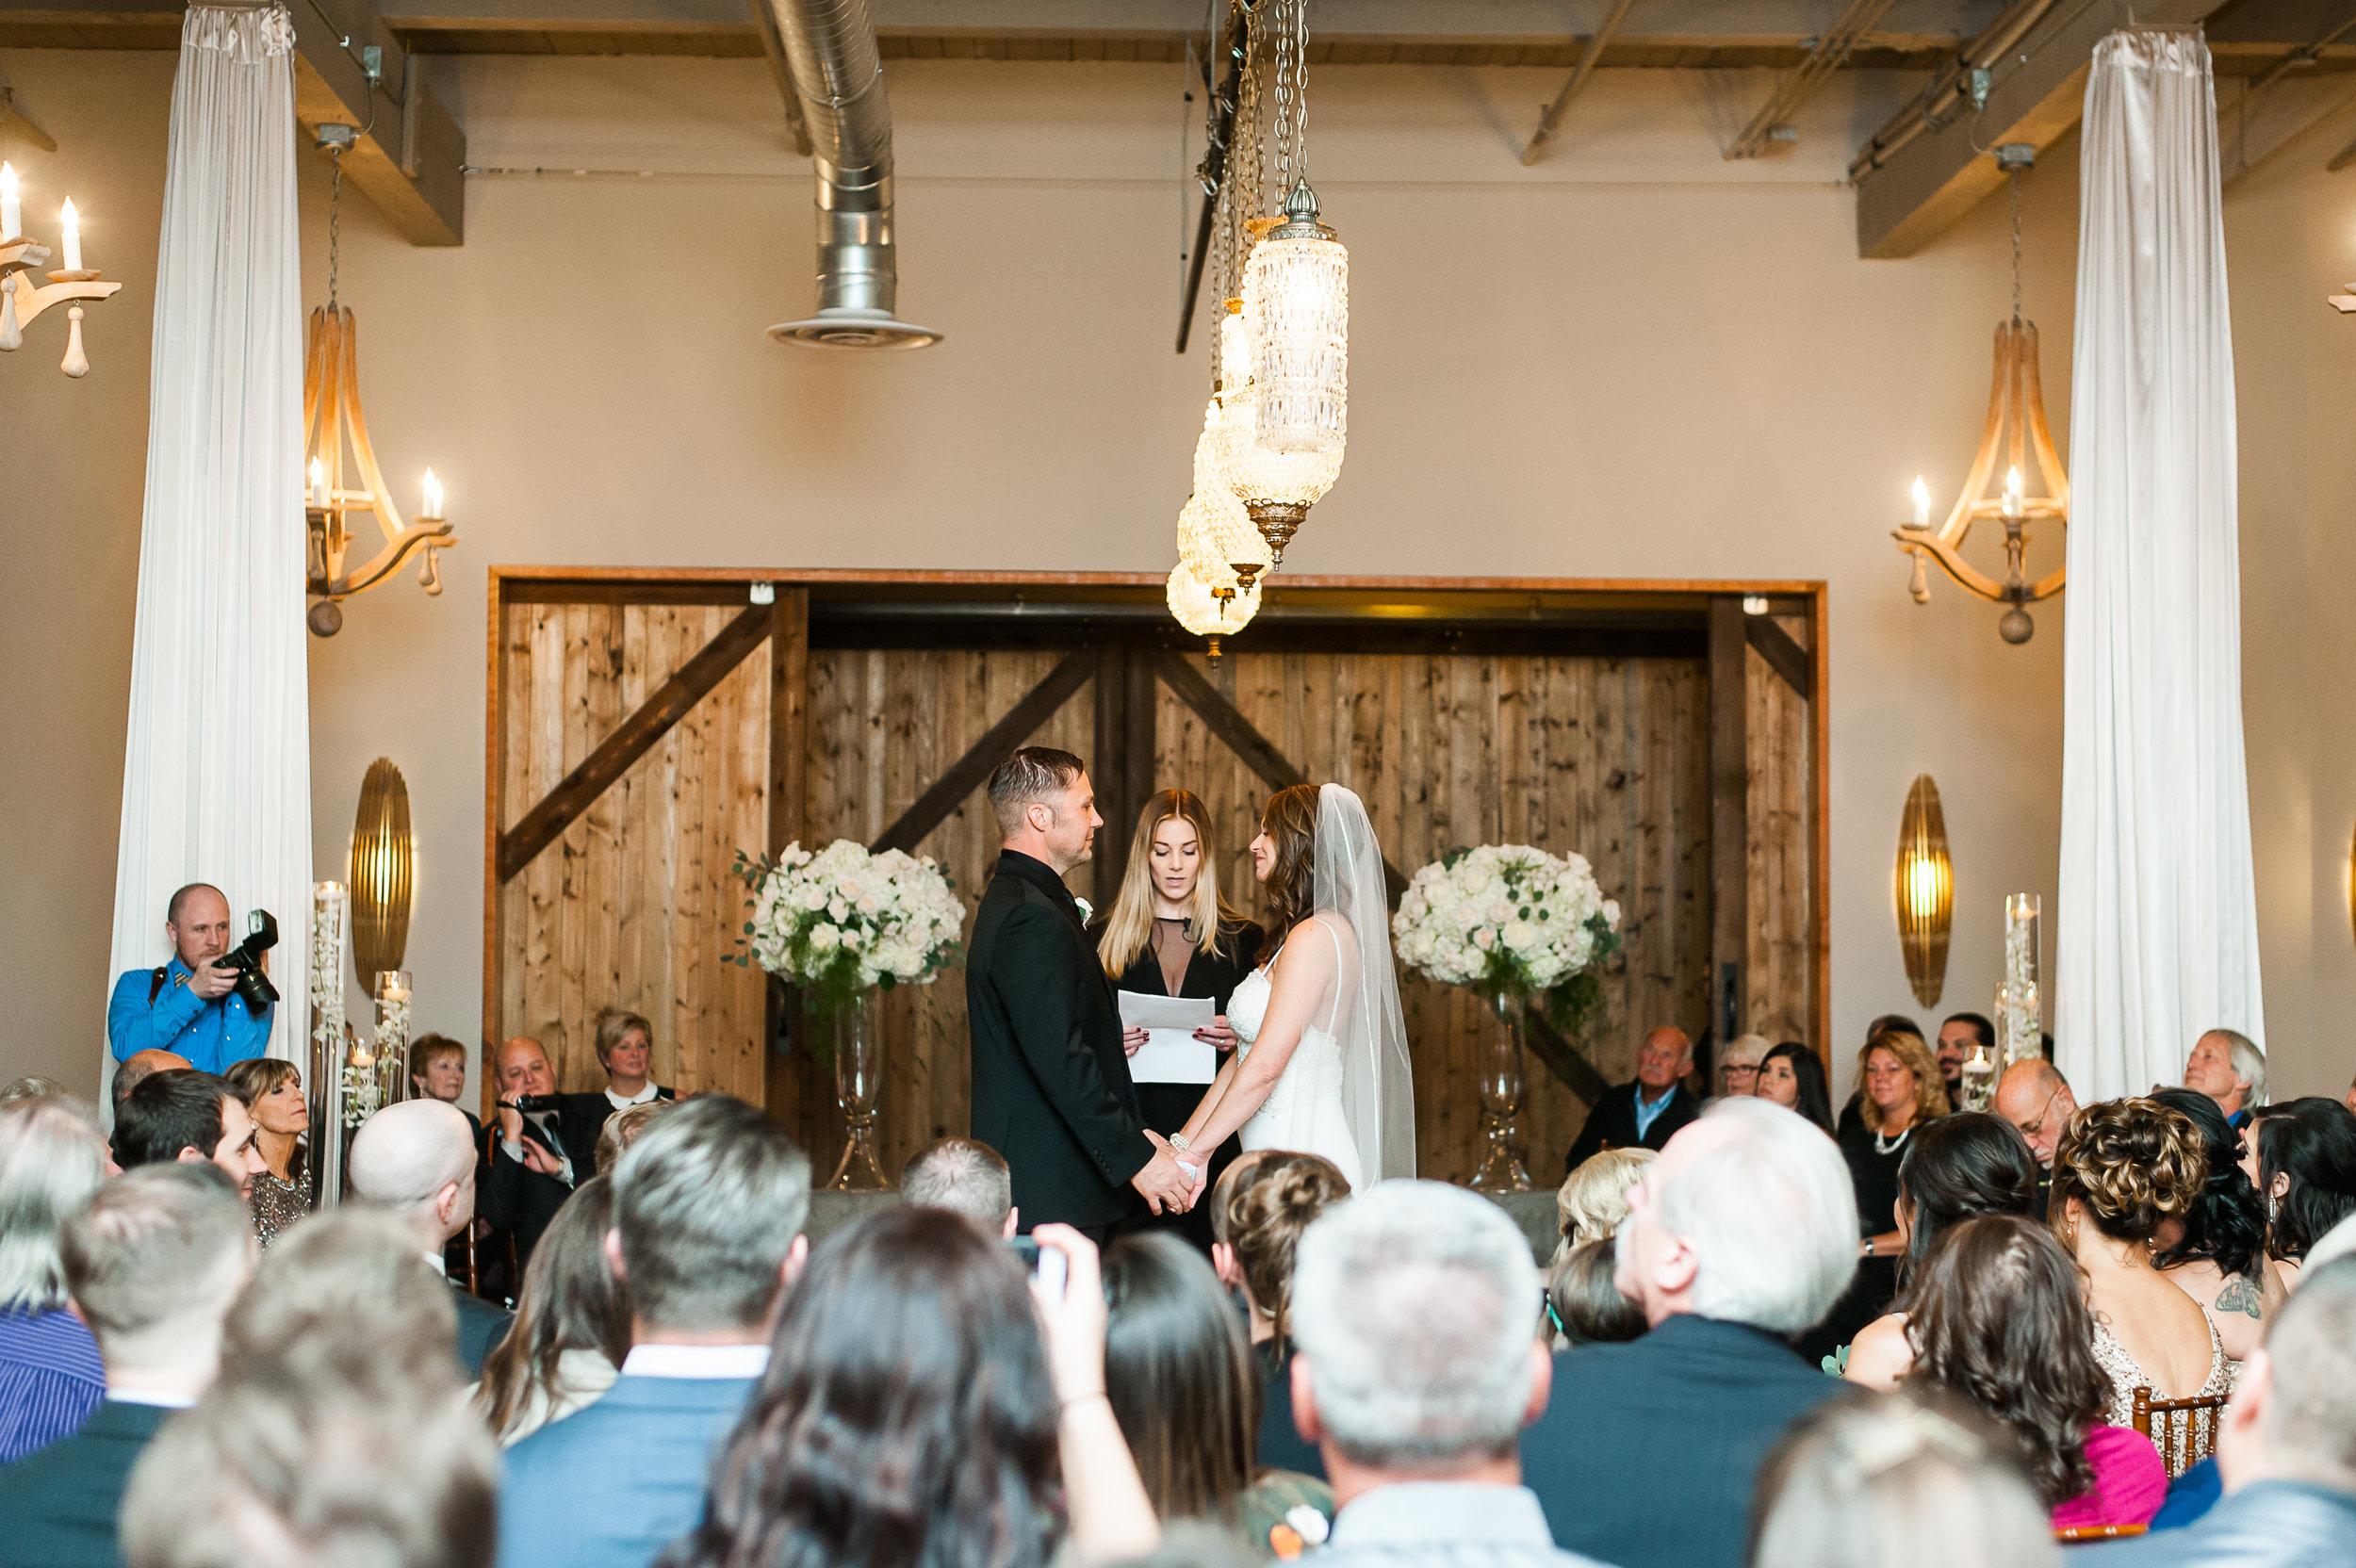 JJ-wedding-Van-Wyhe-Photography-367.jpg